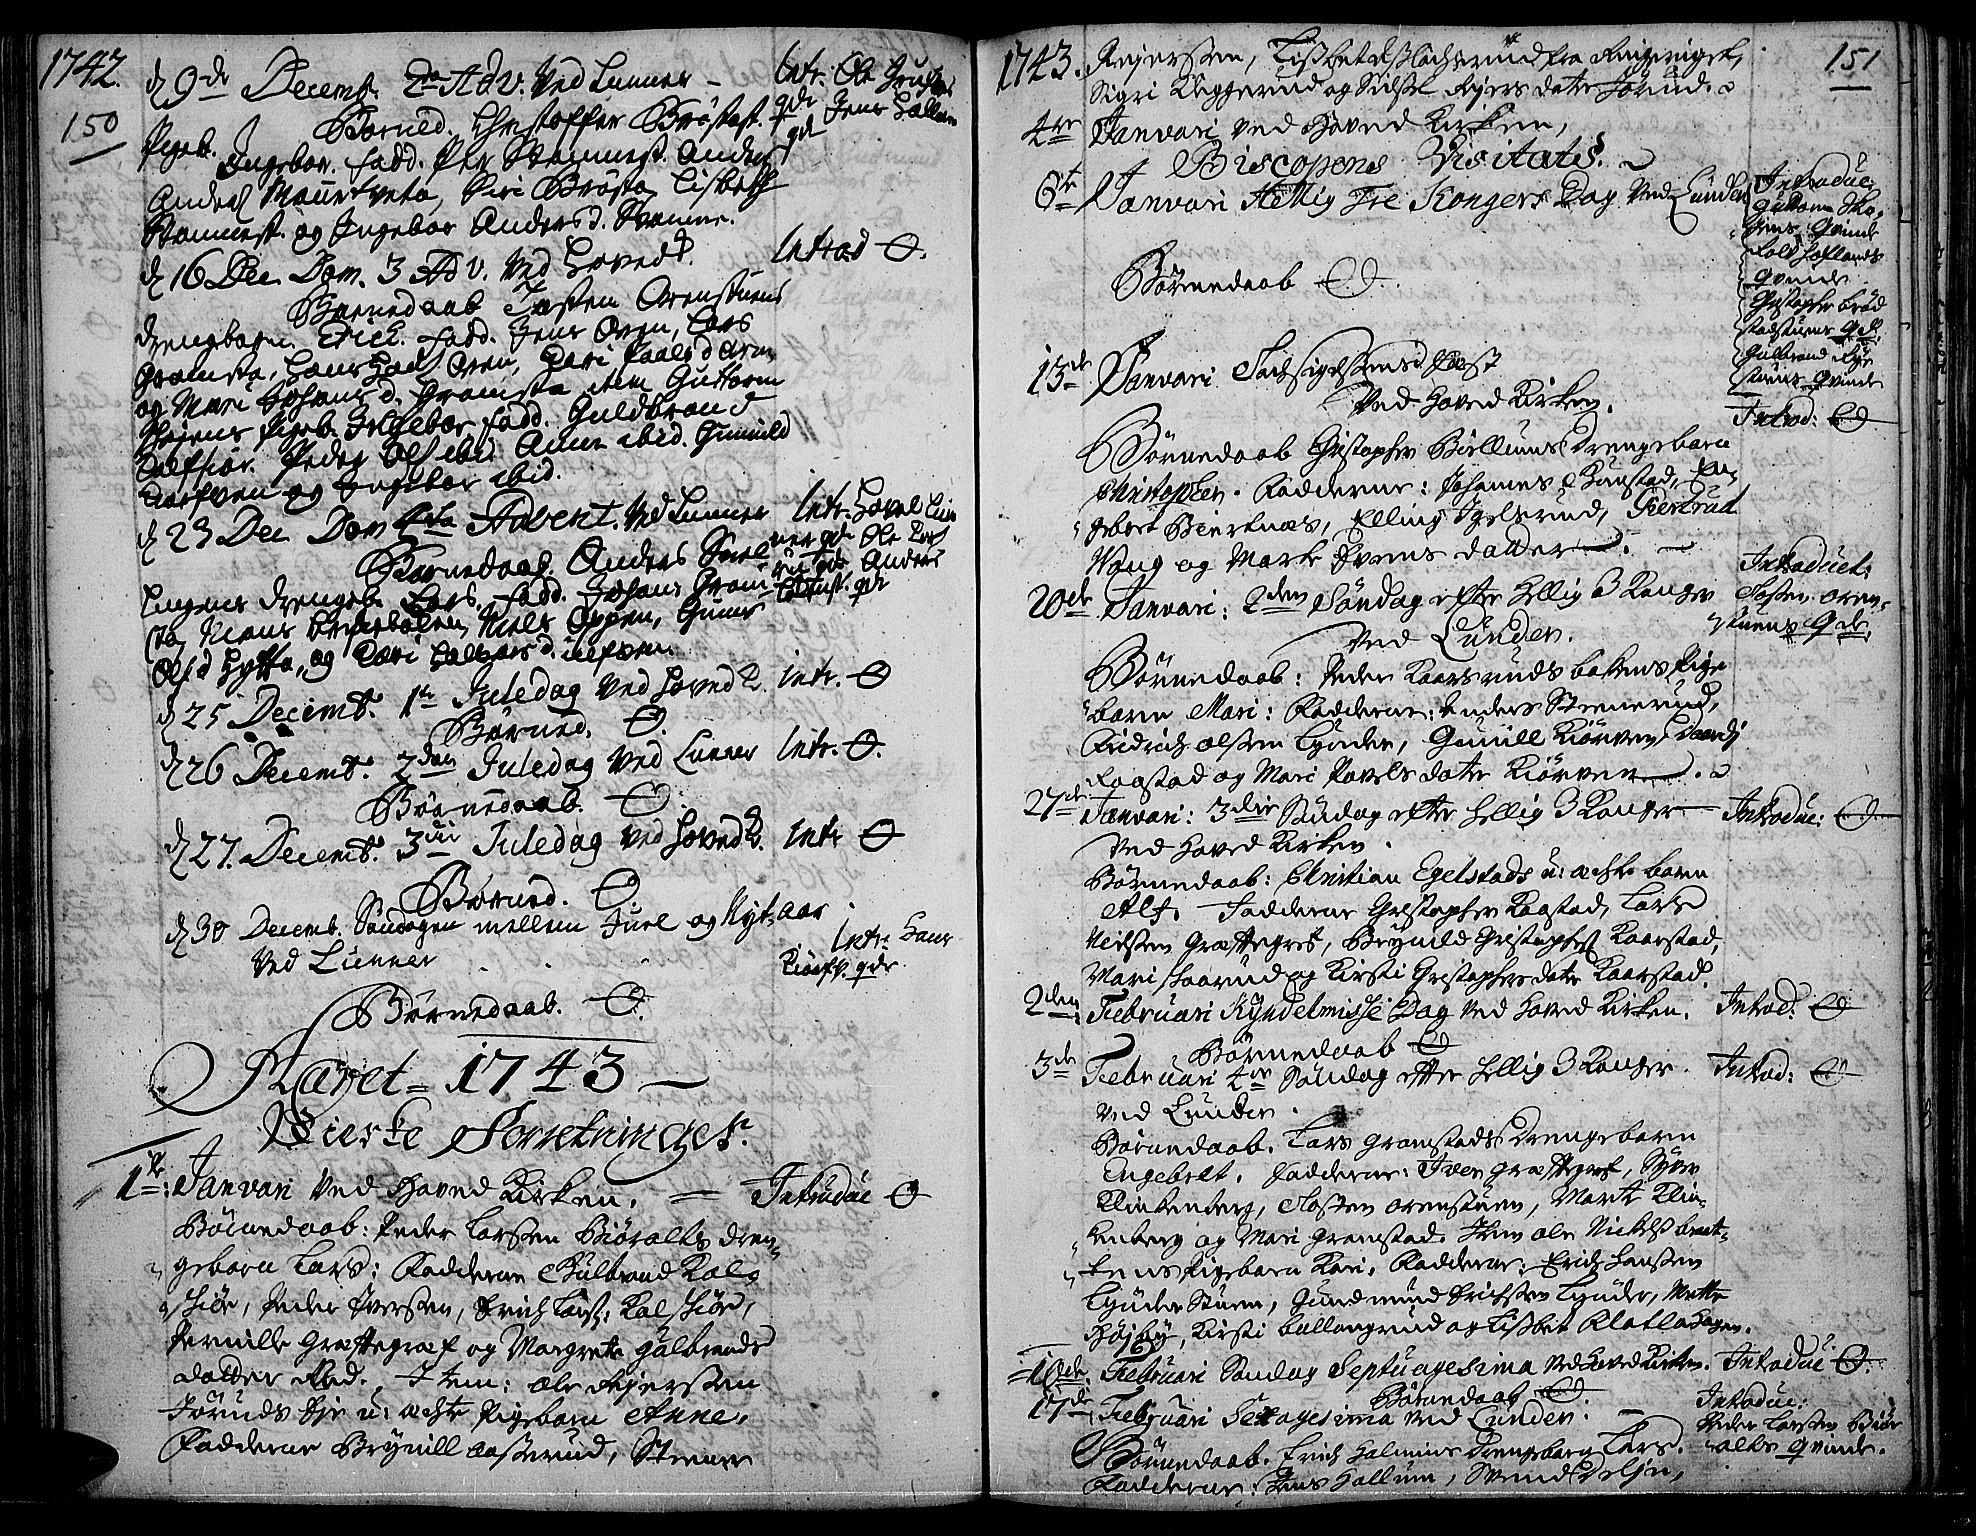 SAH, Jevnaker prestekontor, Ministerialbok nr. 2, 1725-1751, s. 150-151